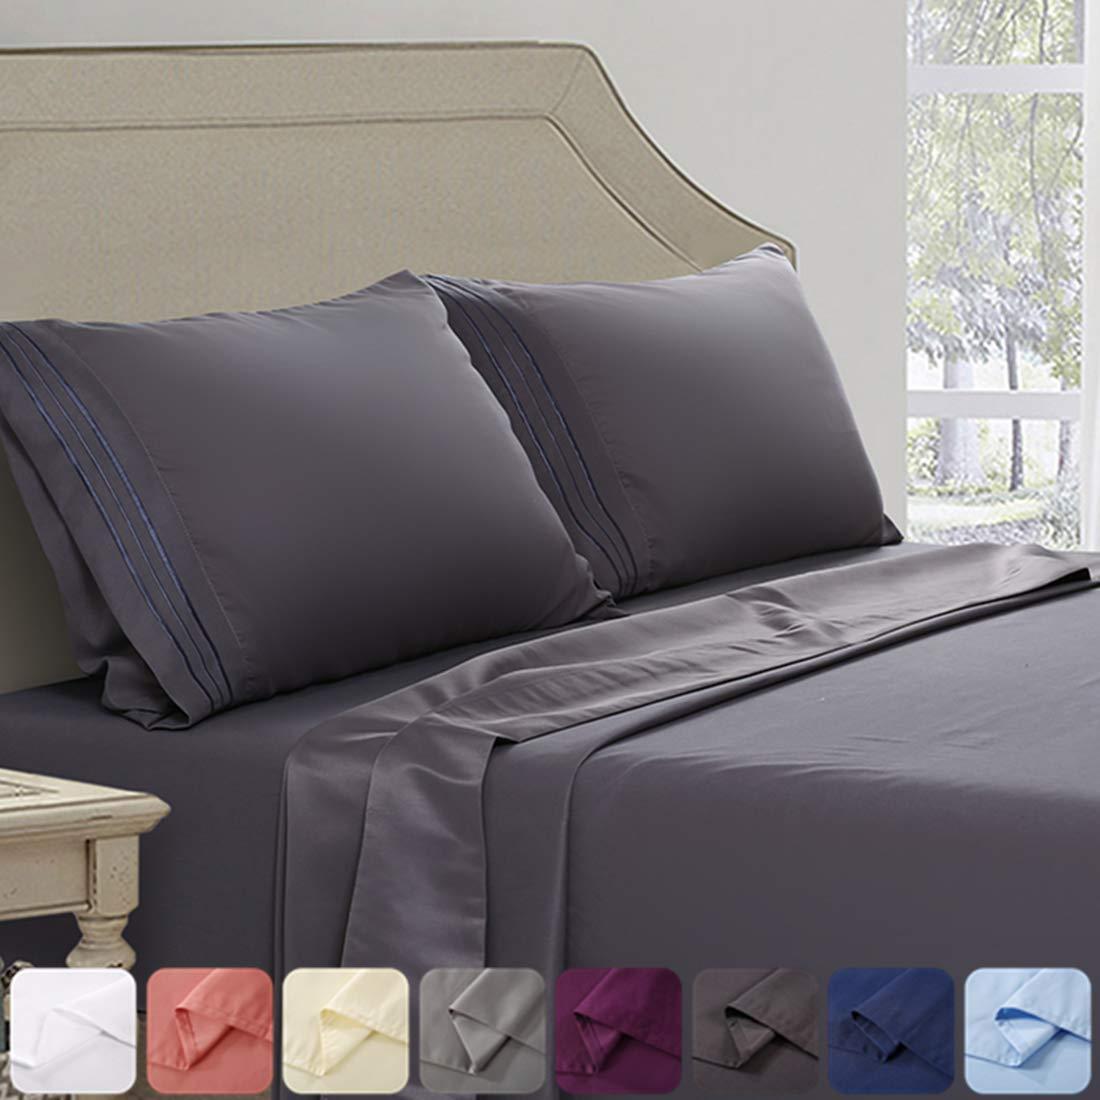 Abakan Twin Bed Sheet Set 3 Piece Super Soft Brushed Microfiber 1800TC Hotel Luxury Premium Cooling Sheet Breathable, Wrinkle, Fade Resistant Deep Pocket Bedding Sheet Set (Twin, Dark Grey)